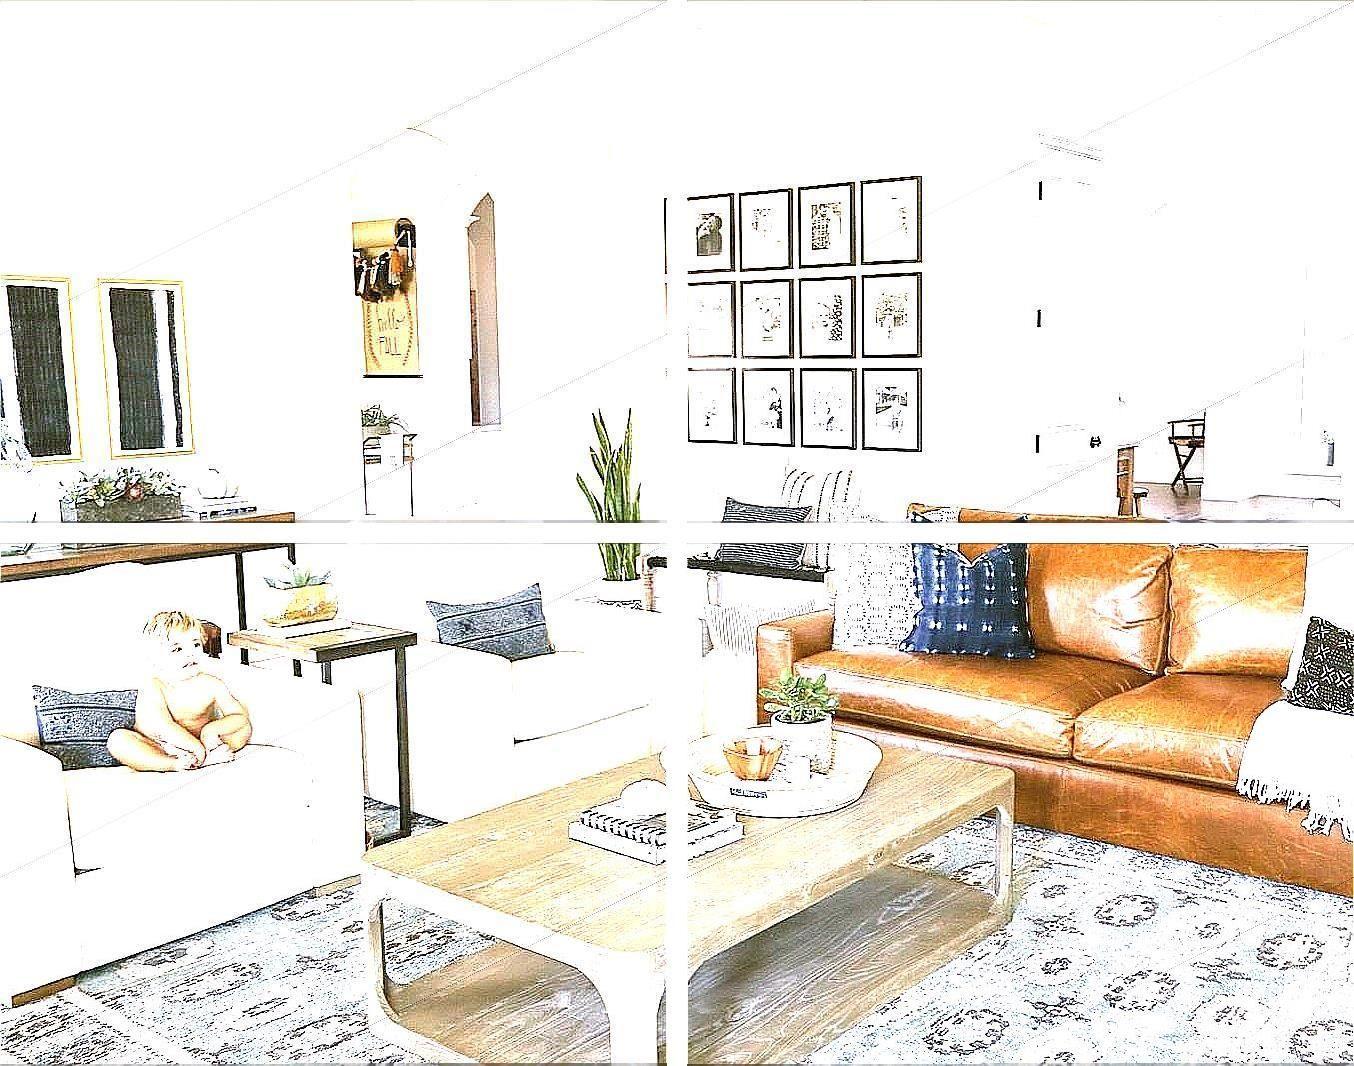 Living Room Sets For Sale Near Me Full Living Room Furniture Sets Lounge Room Chairs Living Room Furniture Living Room Sets Furniture Living Room Sets